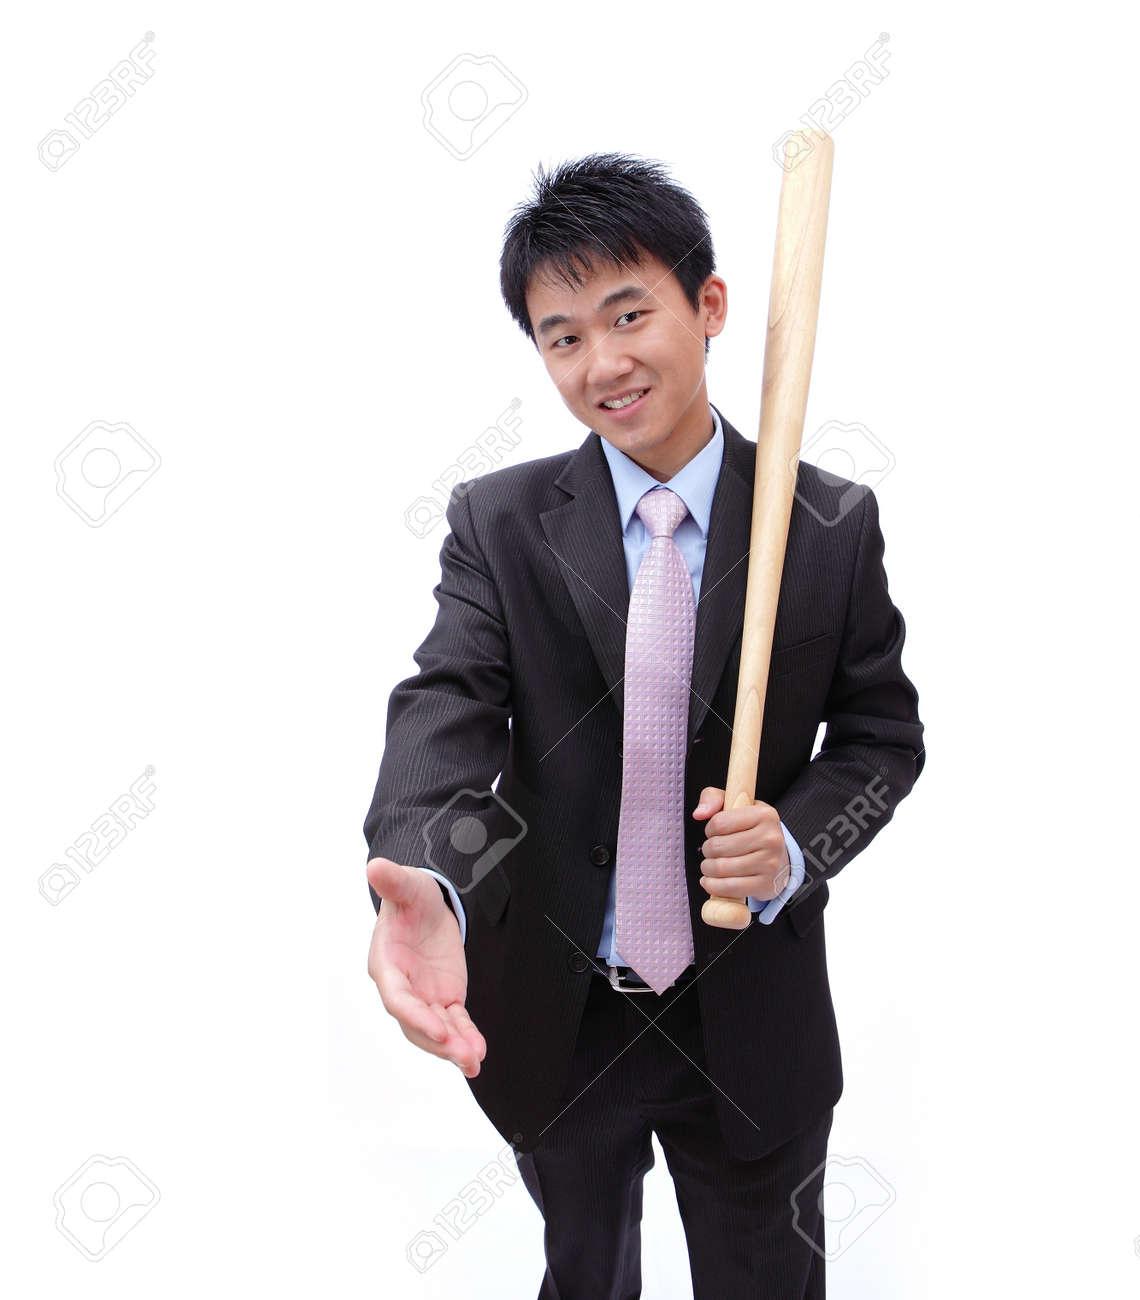 Asian Business man handshake and holding baseball bat Stock Photo - 11344230